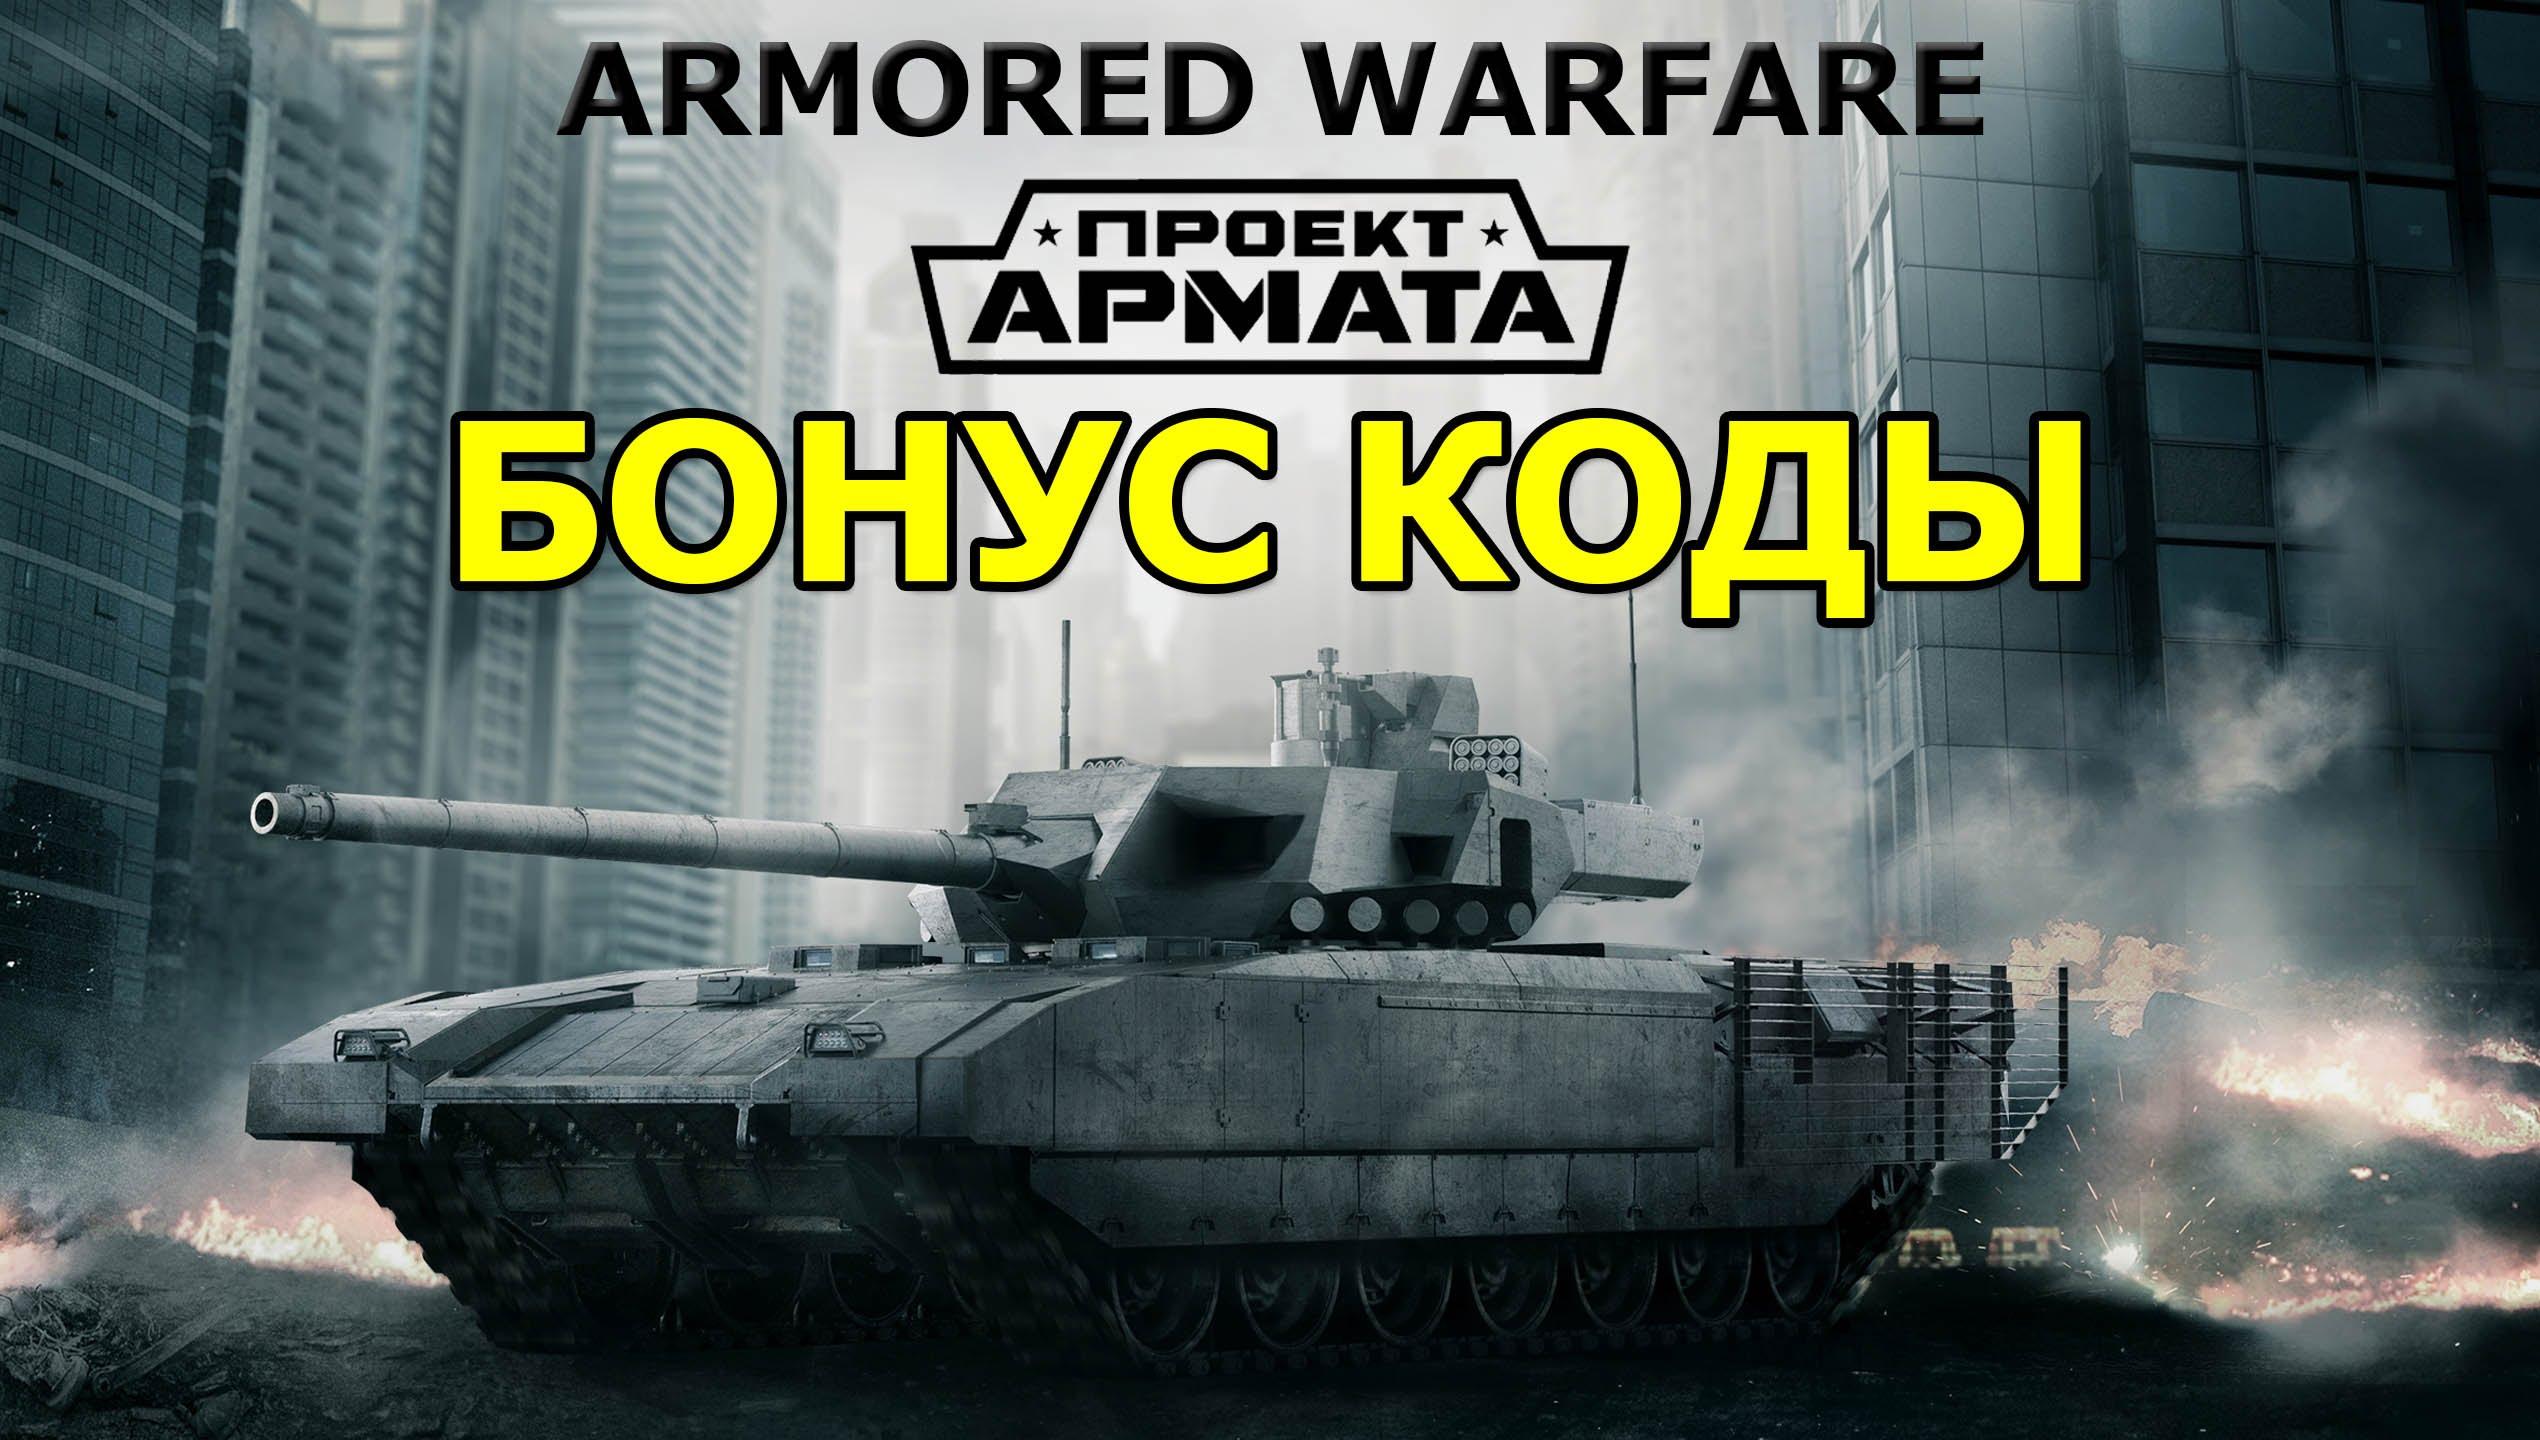 бонус кодов для armored warfare проект армата 2016